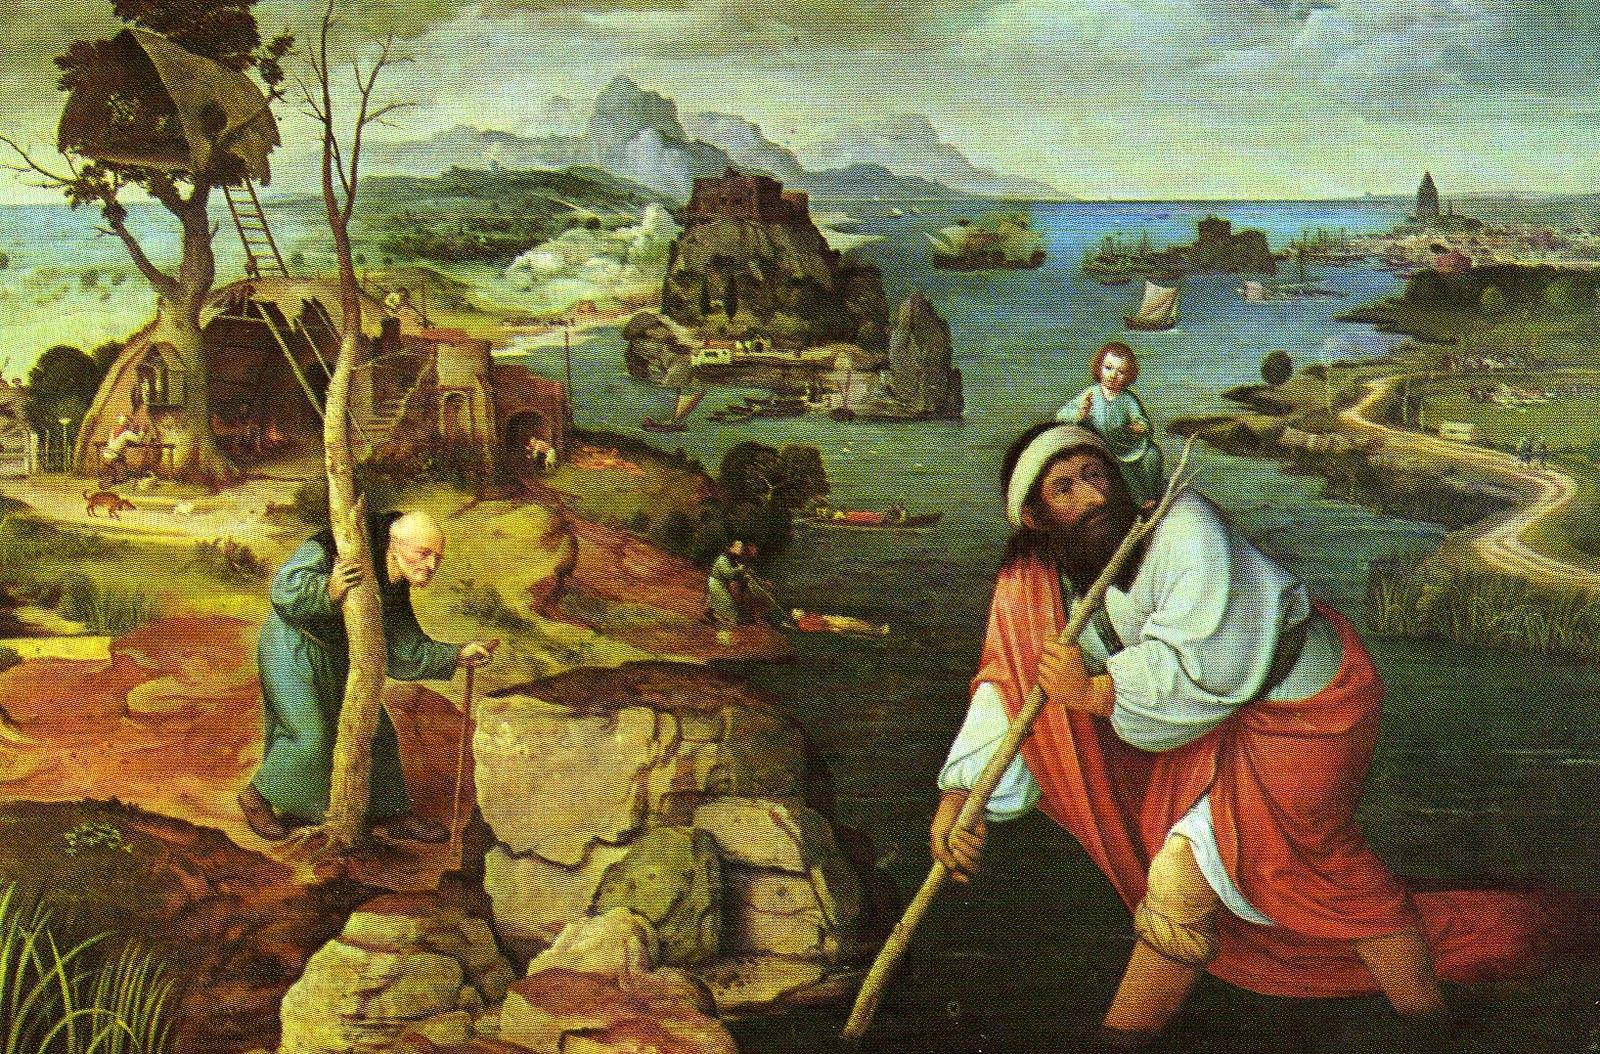 Paisaje con San Cristóbal. Obra de Joachim Patinir. Año 1520